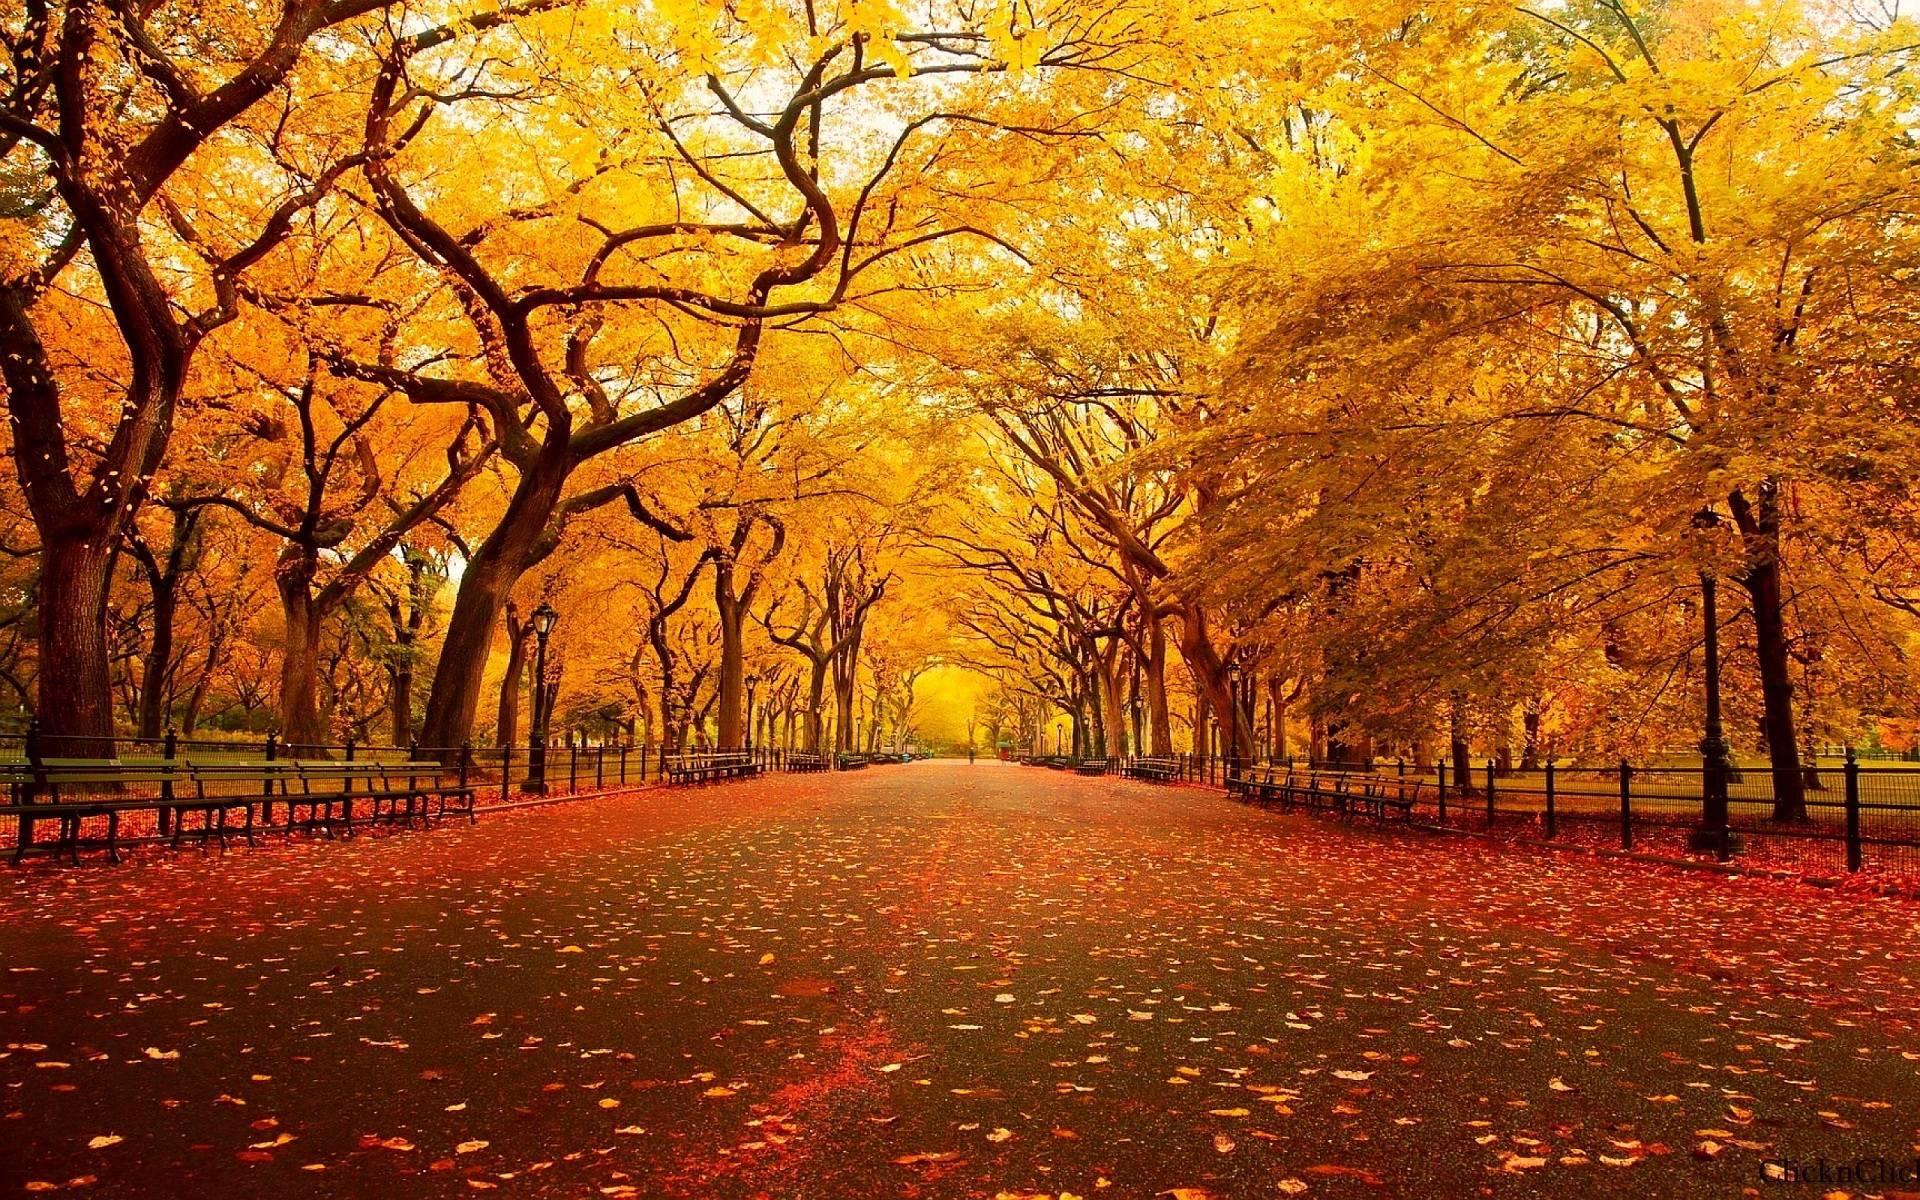 Fall foliage wallpaper for desktop 1920x1200 fall thanksgiving wallpapers wallpaper cave voltagebd Images